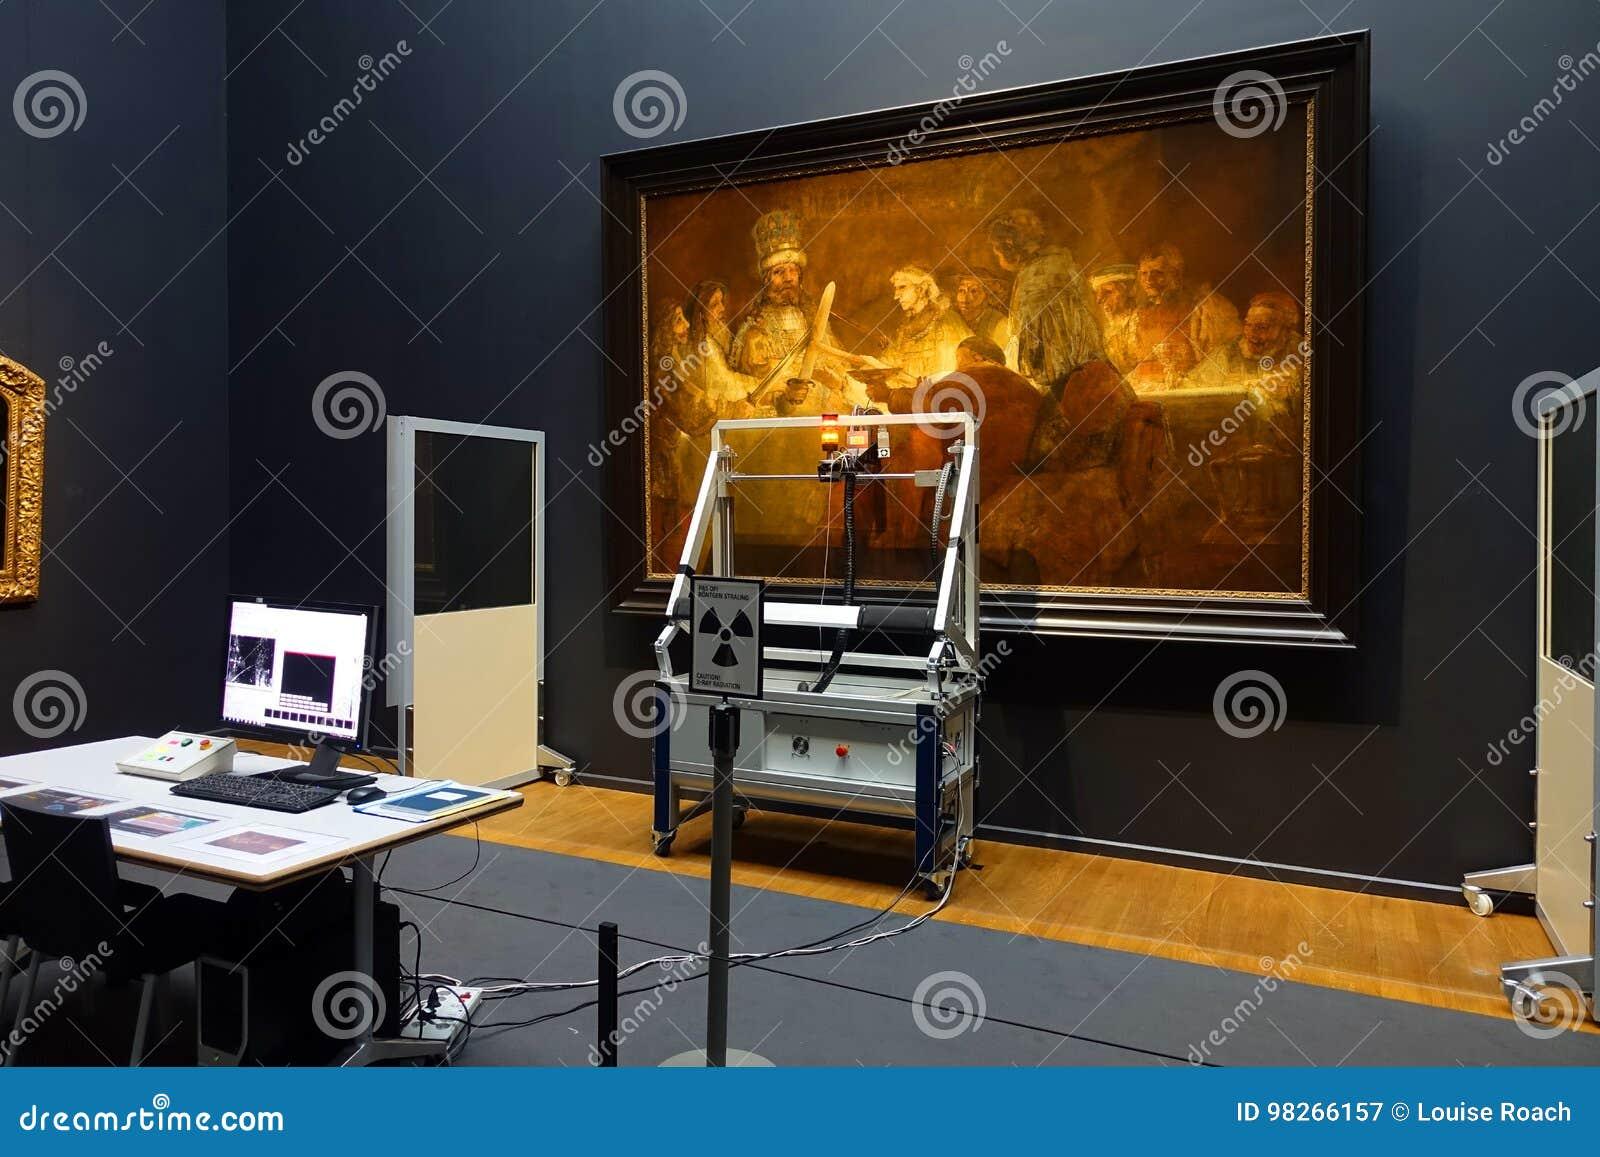 Digitizing Art